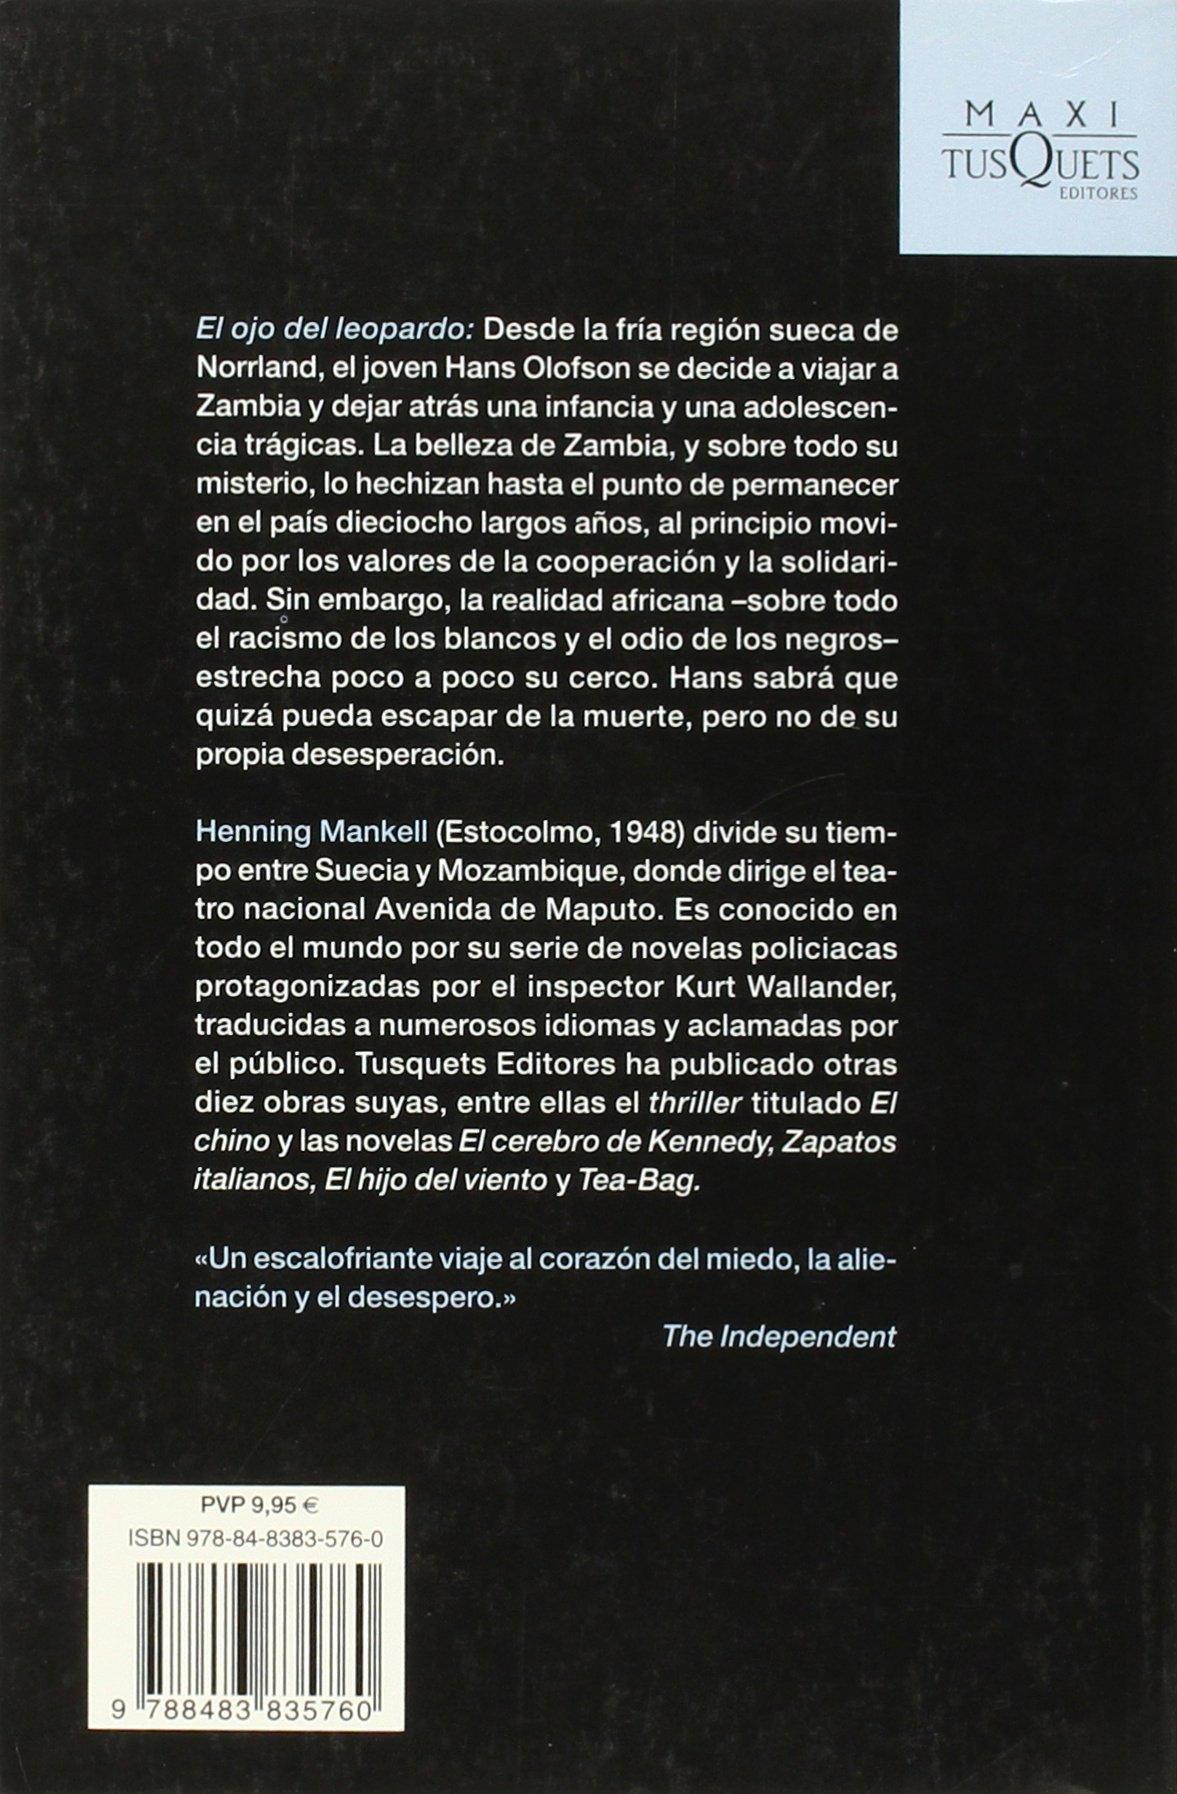 El ojo del leopardo (Maxi Tusquets) (Spanish Edition): Henning Mankell: 9788483835760: Amazon.com: Books